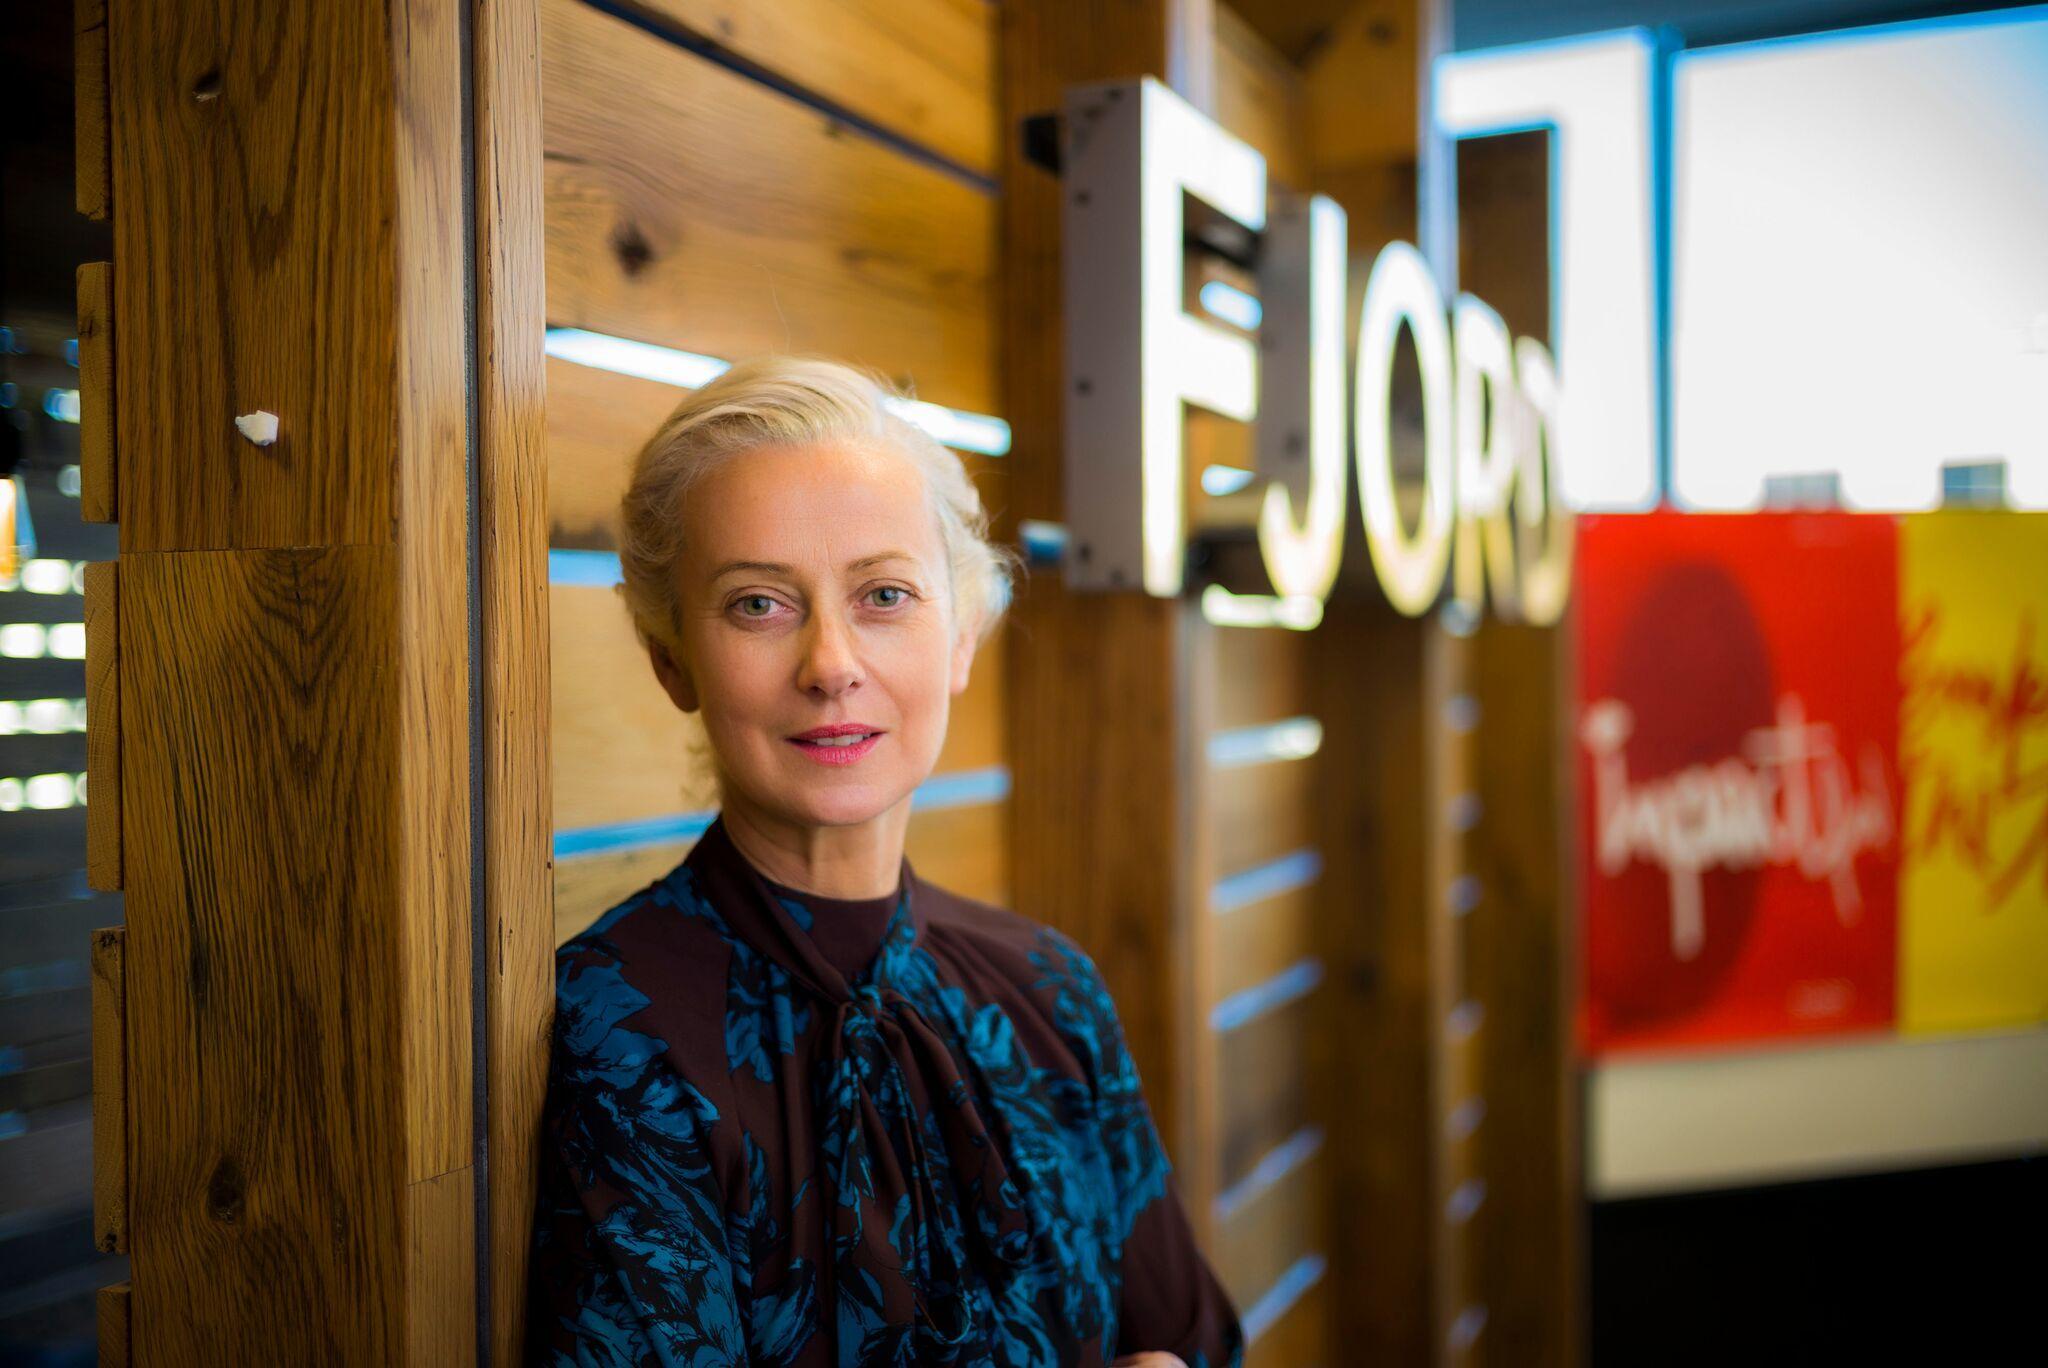 Lorna Ross will lead Fjord's first design studio in Dublin